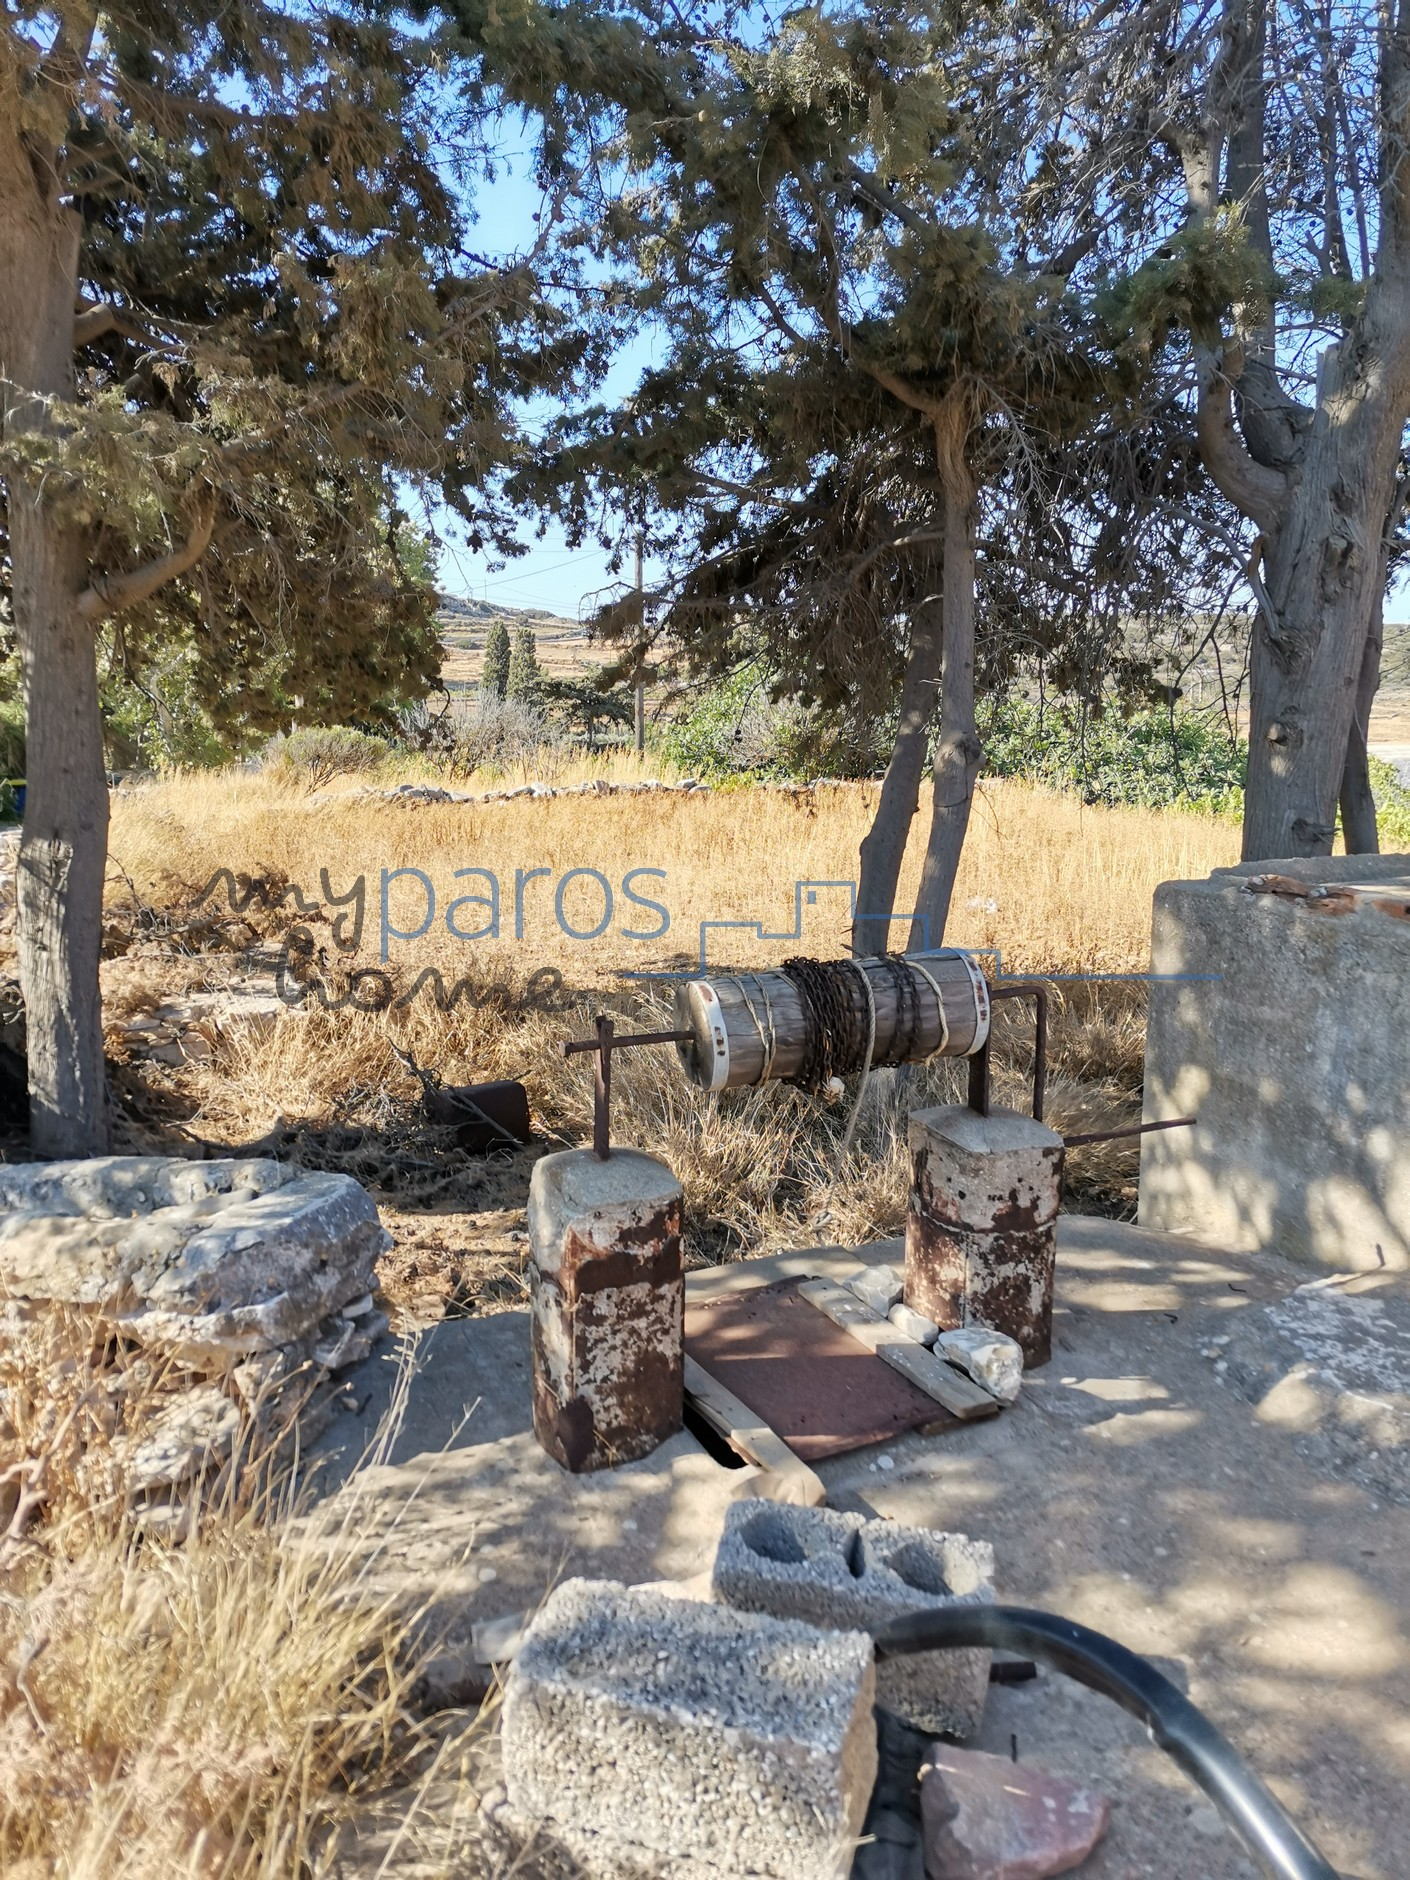 B 241 ΟΙΚΟΠΕΔΟ ΕΝΤΟΣ ΟΙΚΙΣΜΟΥ ΣΤΗΝ ΘΕΣΗ ''ΚΑΜΠΟΣ' ΑΓΚΑΙΡΙΑ ΠΑΡΟΥ'_3